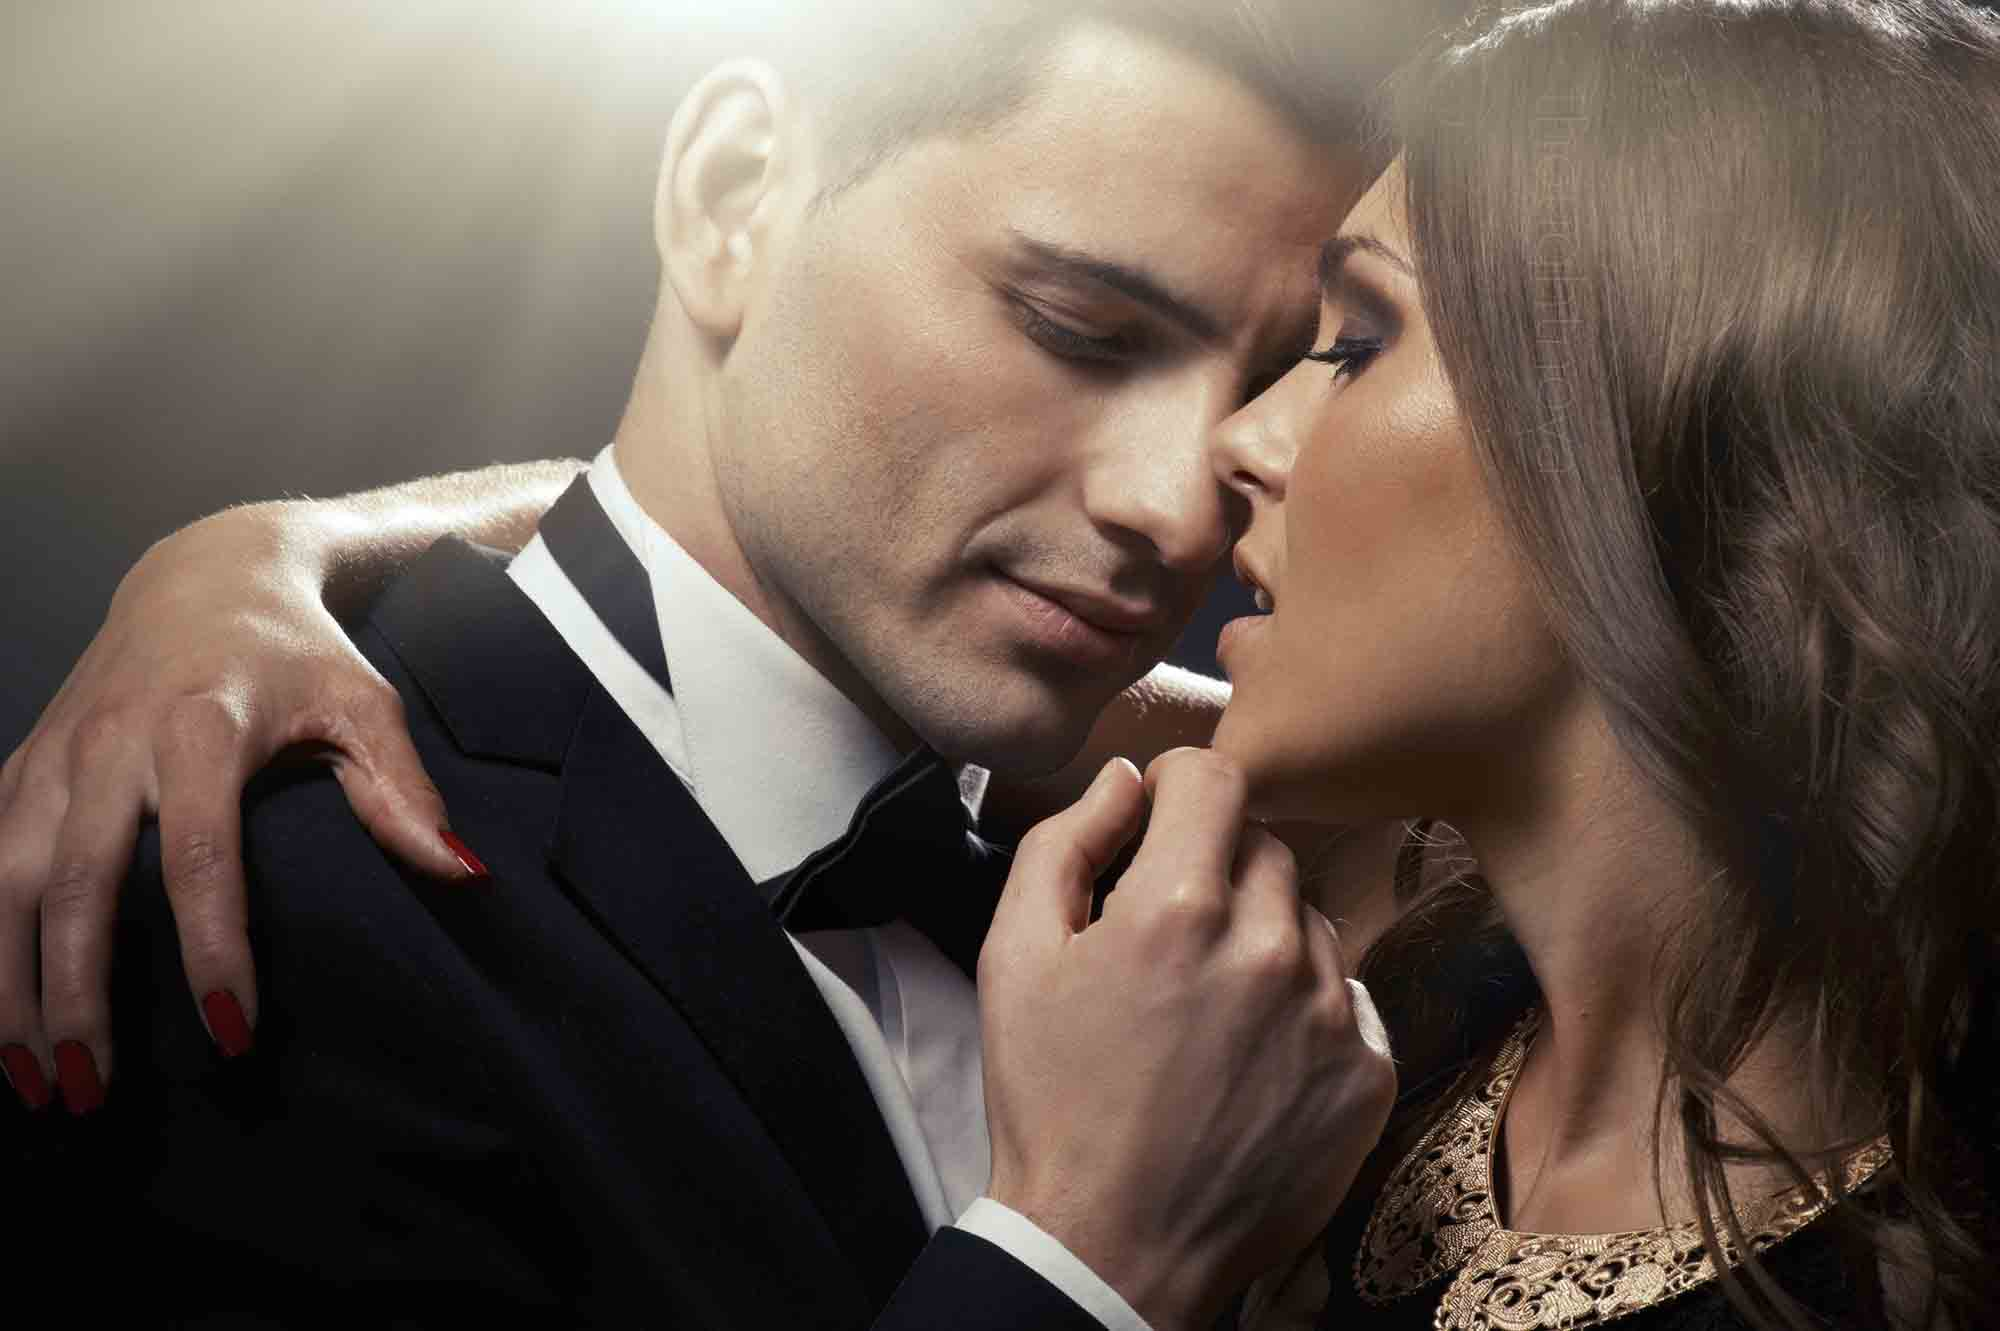 Emotionally Mature Women Don't Need Fairytale Romance